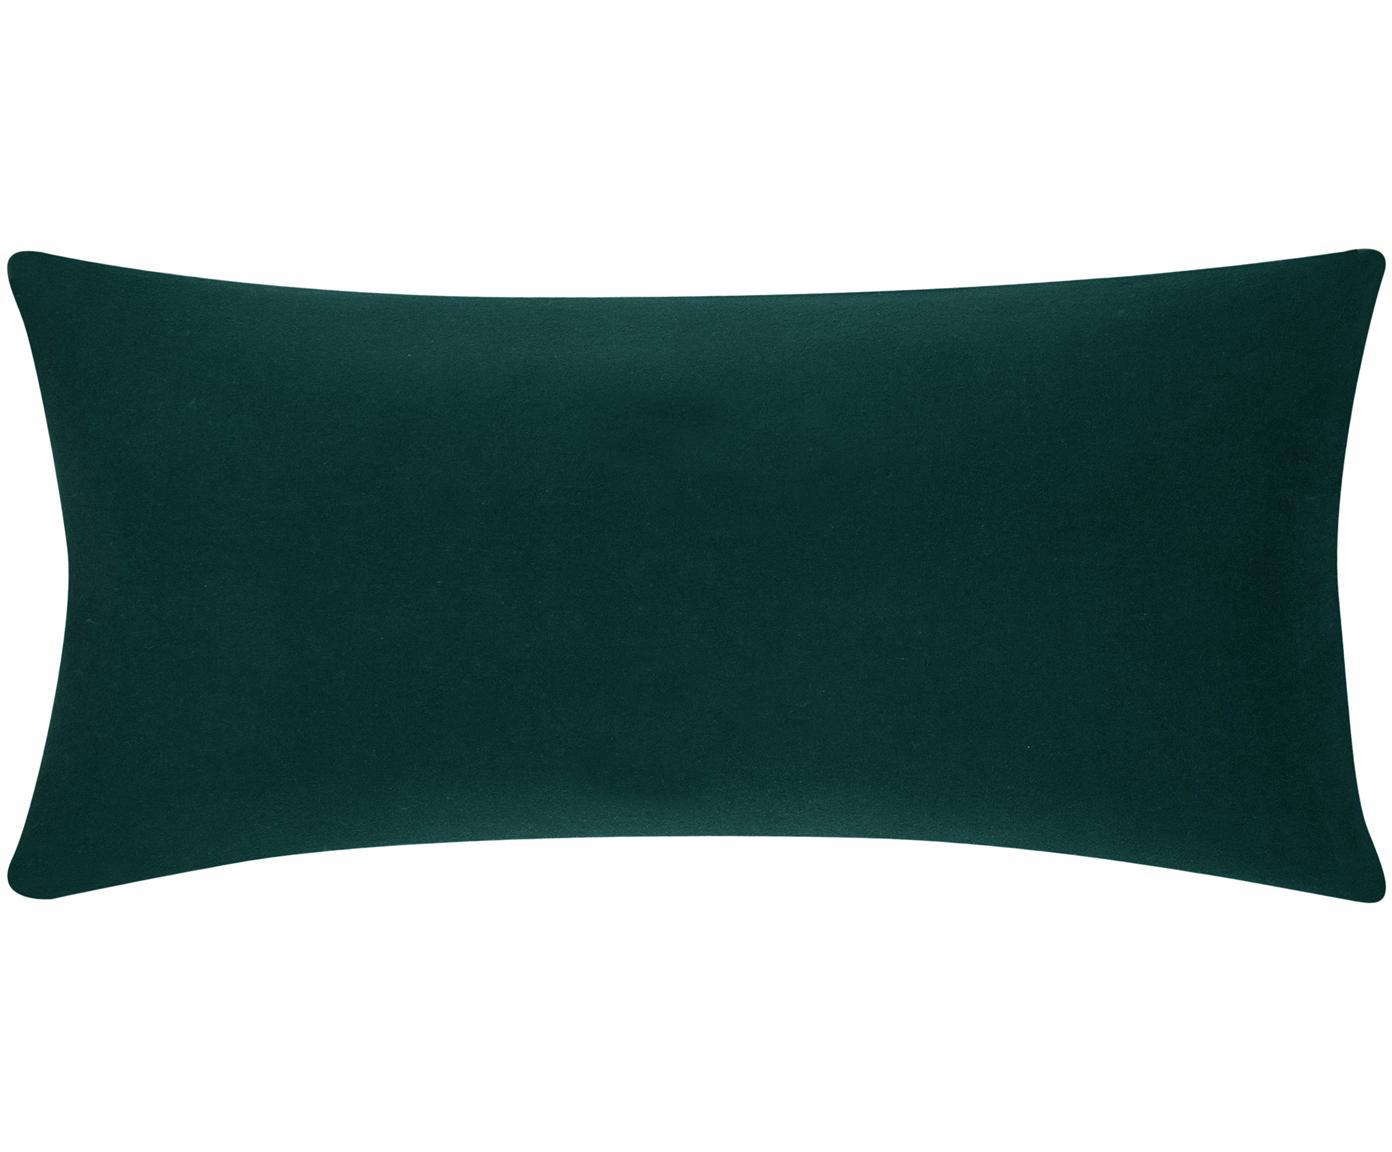 Flanell-Kissenbezüge Biba in Waldgrün, 2 Stück, Webart: Flanell Flanell ist ein s, Waldgrün, 40 x 80 cm